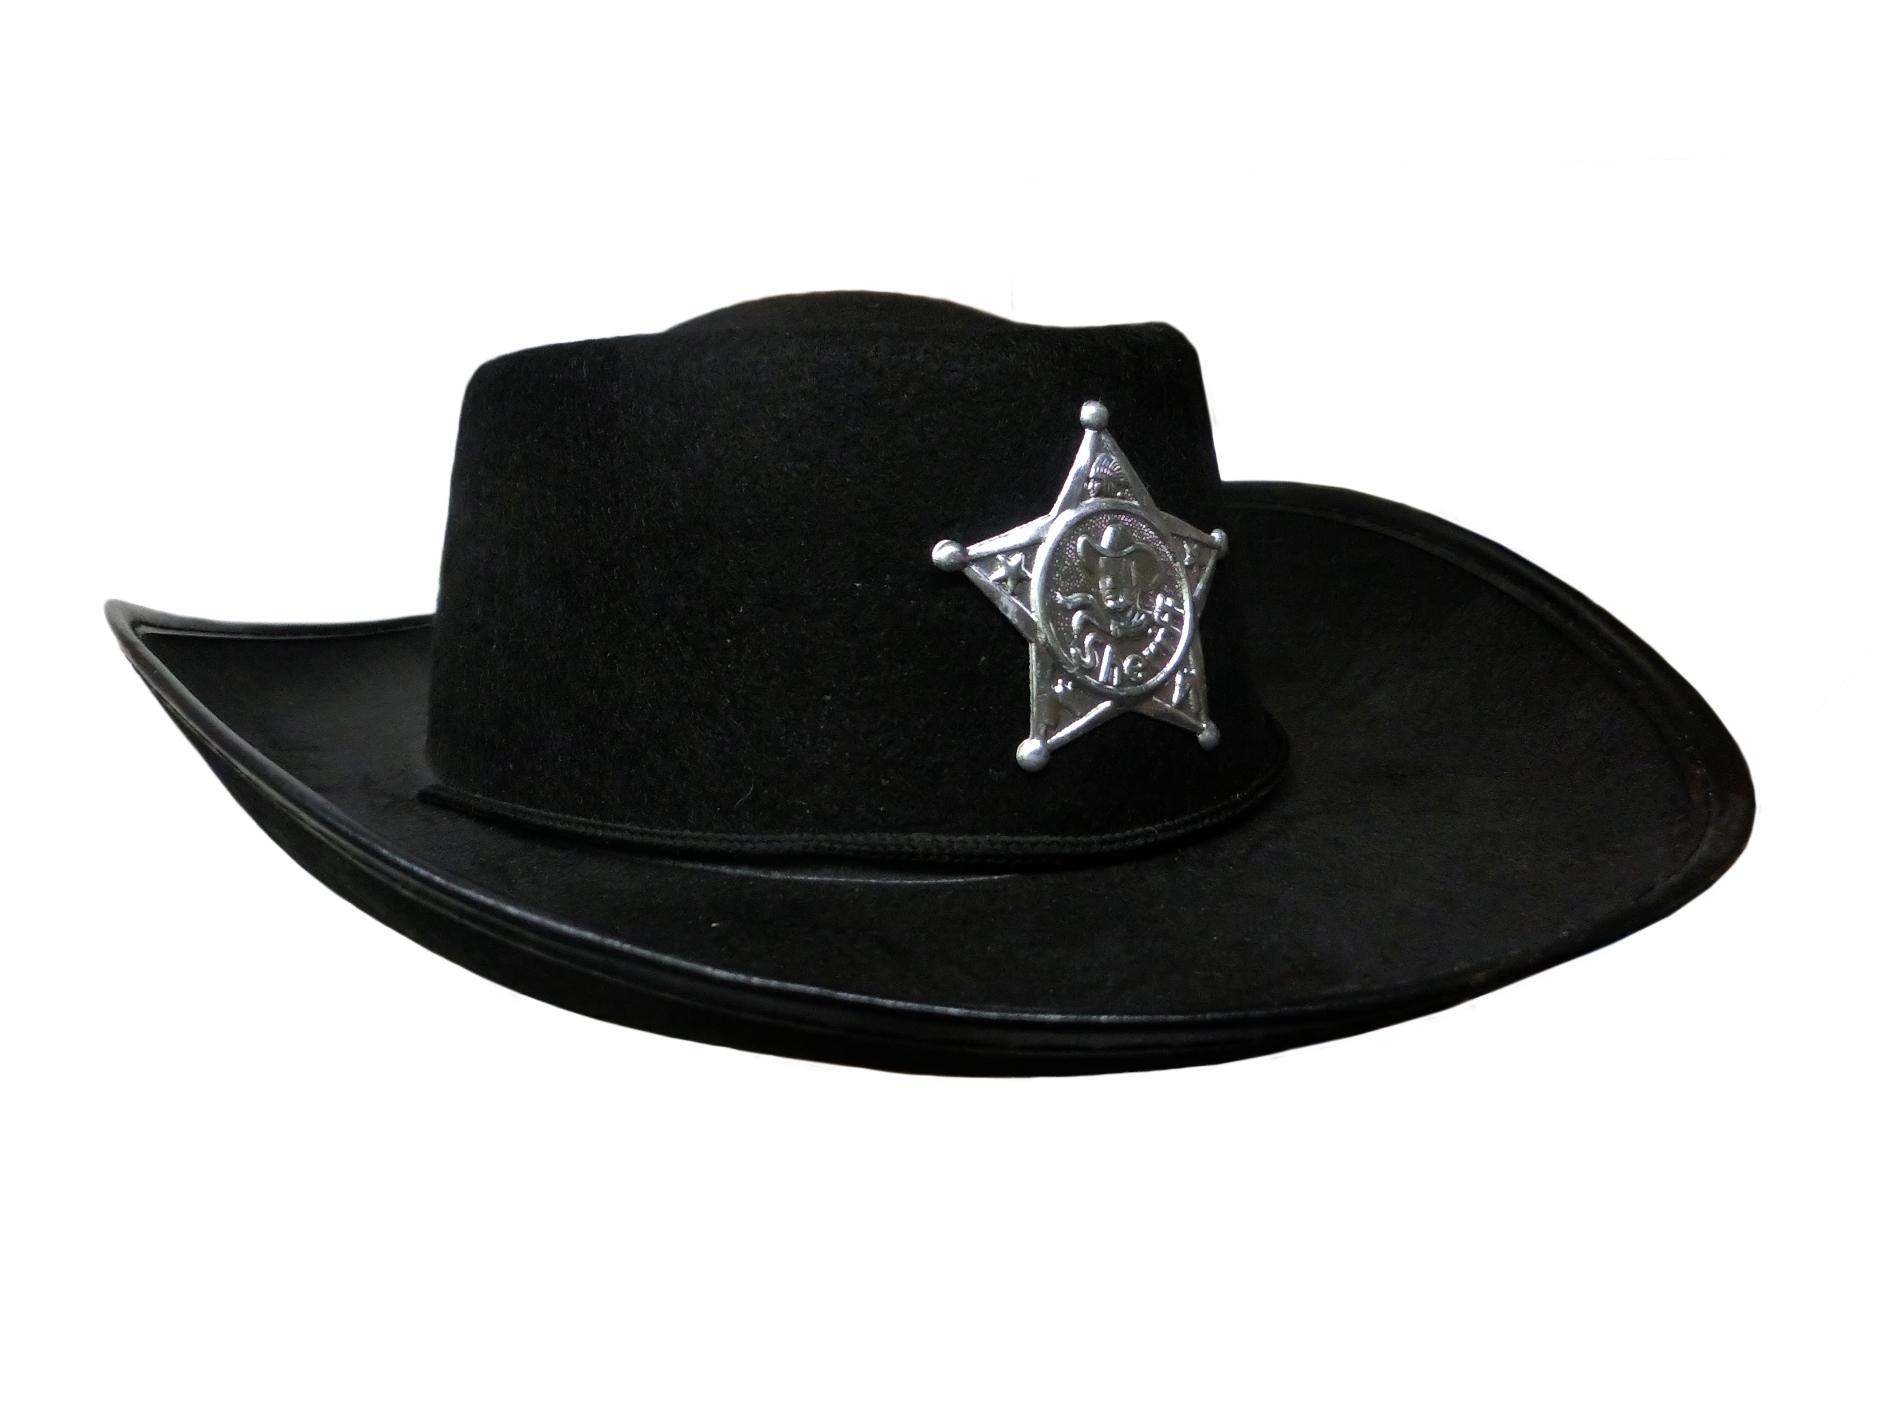 Black Child Boys Cowboy Sheriff Hat Costume Accessory Lone Ranger Western  Prop 748affa500d